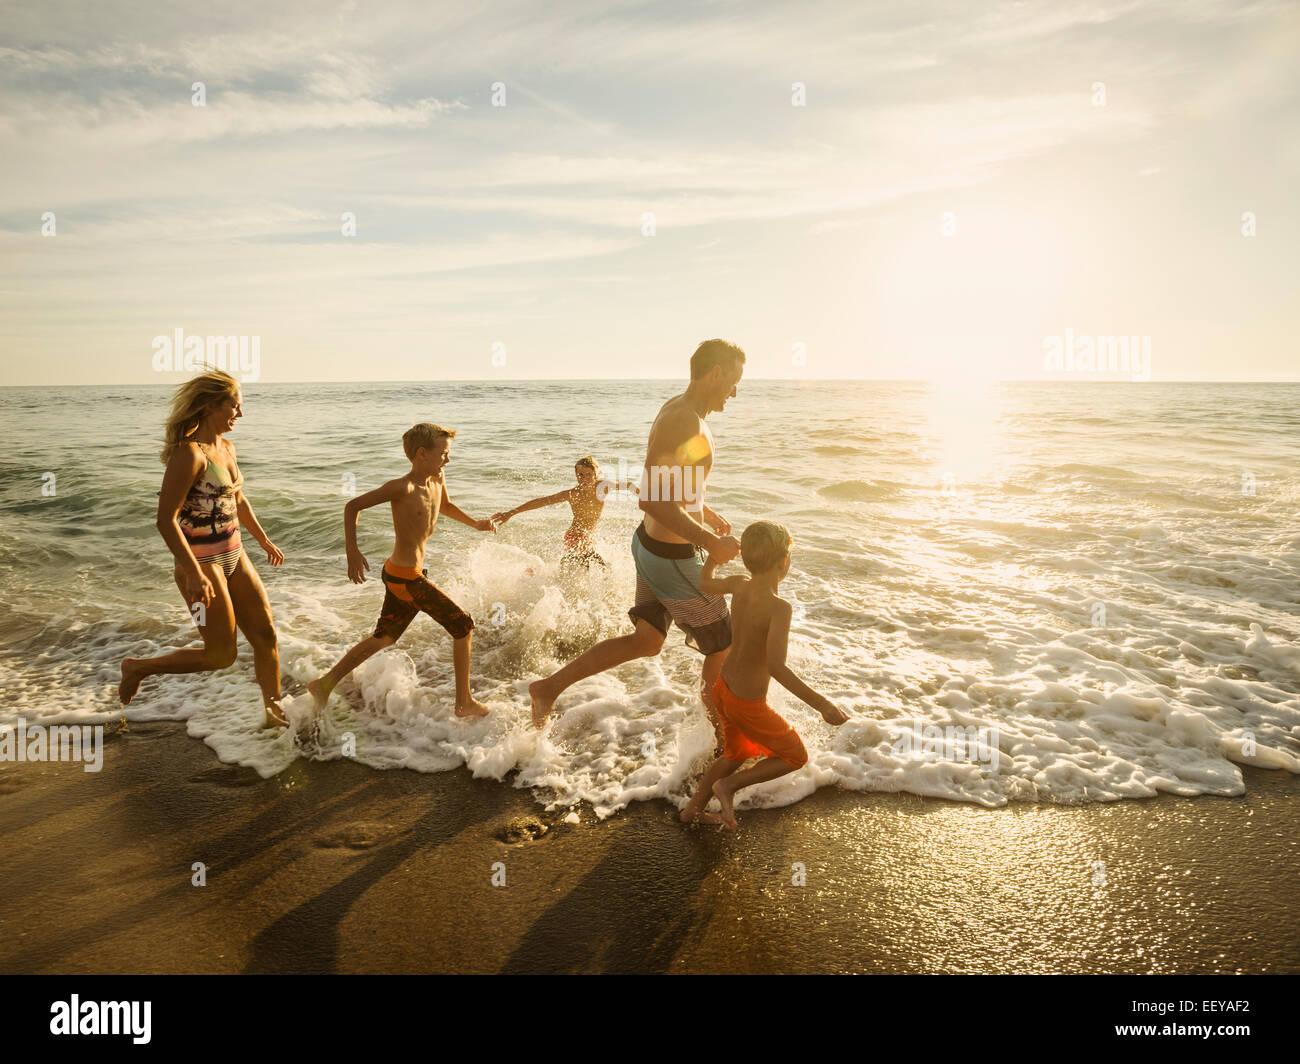 États-unis, Californie, Laguna Beach, Famille avec trois enfants (6-7, 10-11, 14-15) running on beach Photo Stock